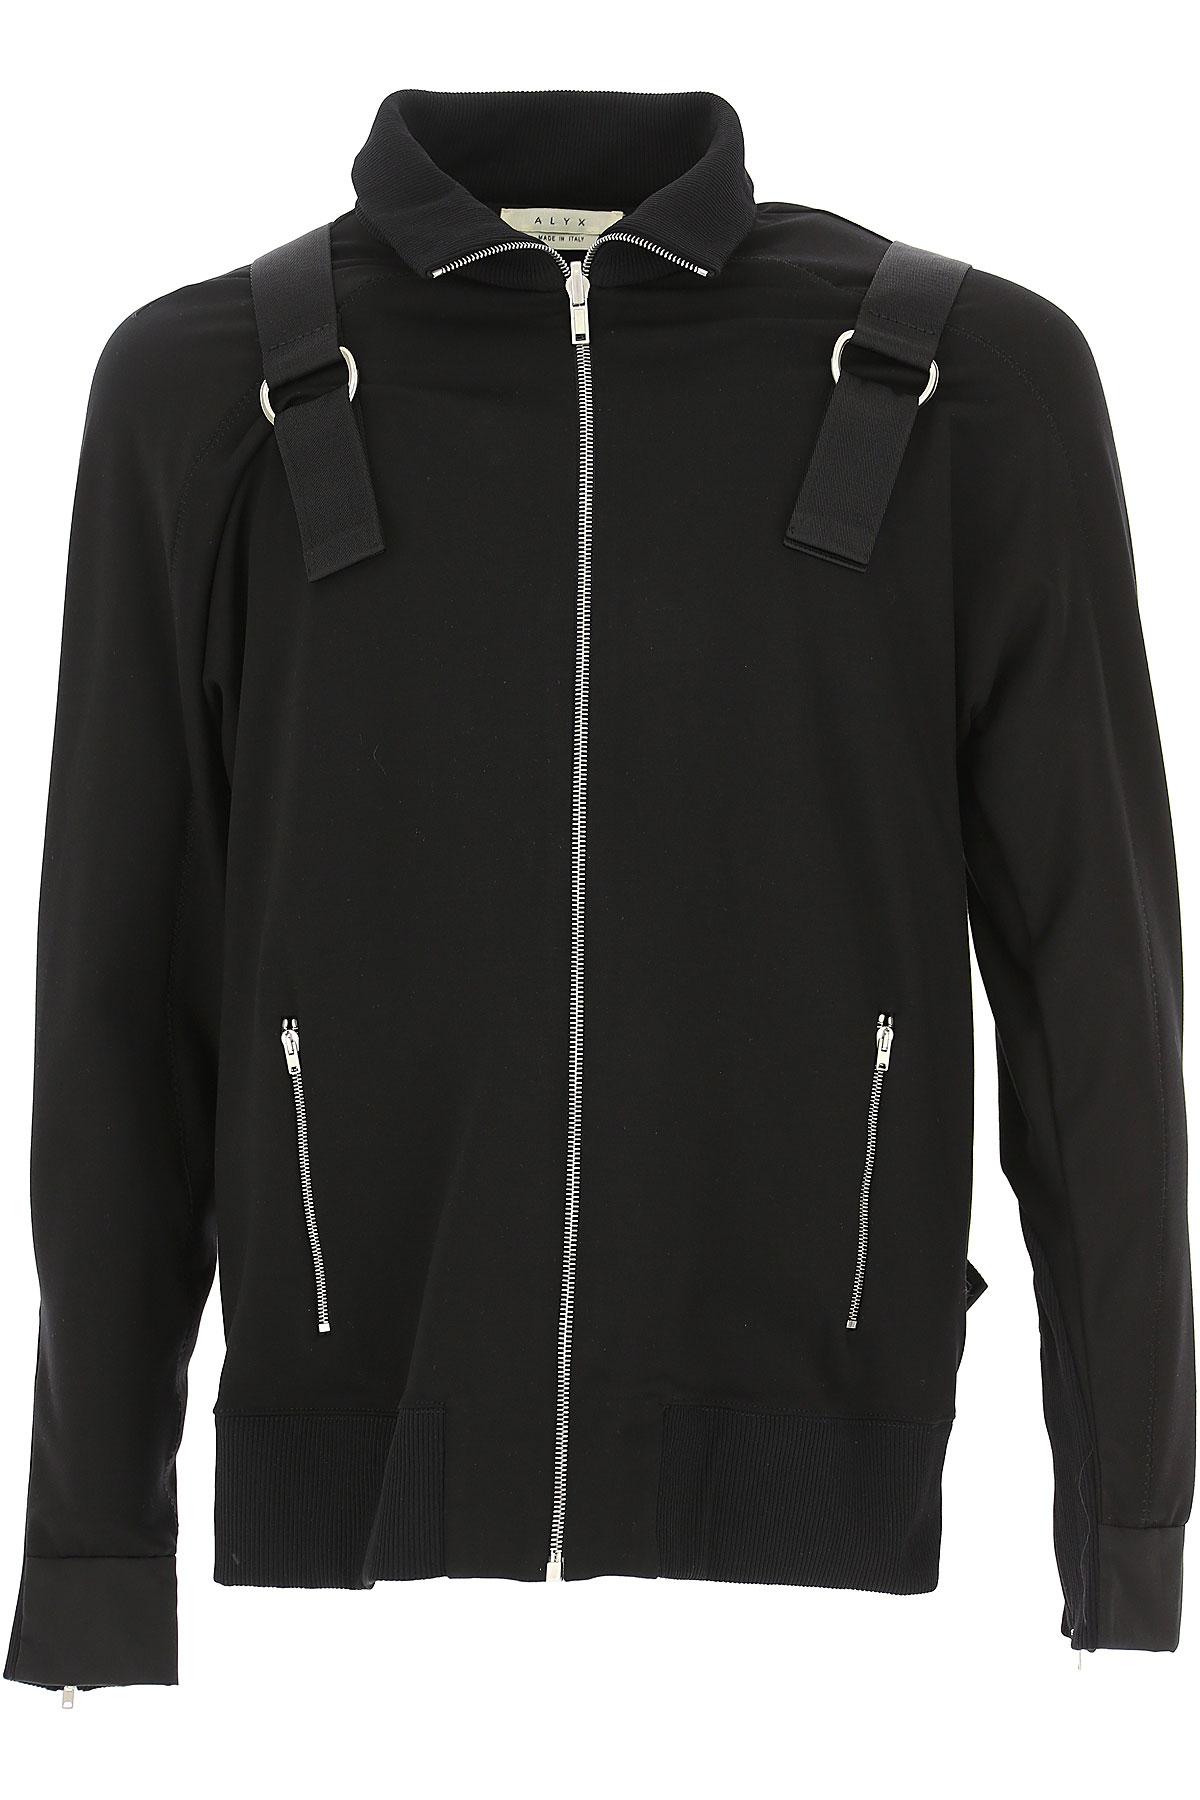 ALYX Sweatshirt for Men On Sale in Outlet, Black, Viscose, 2019, L M S